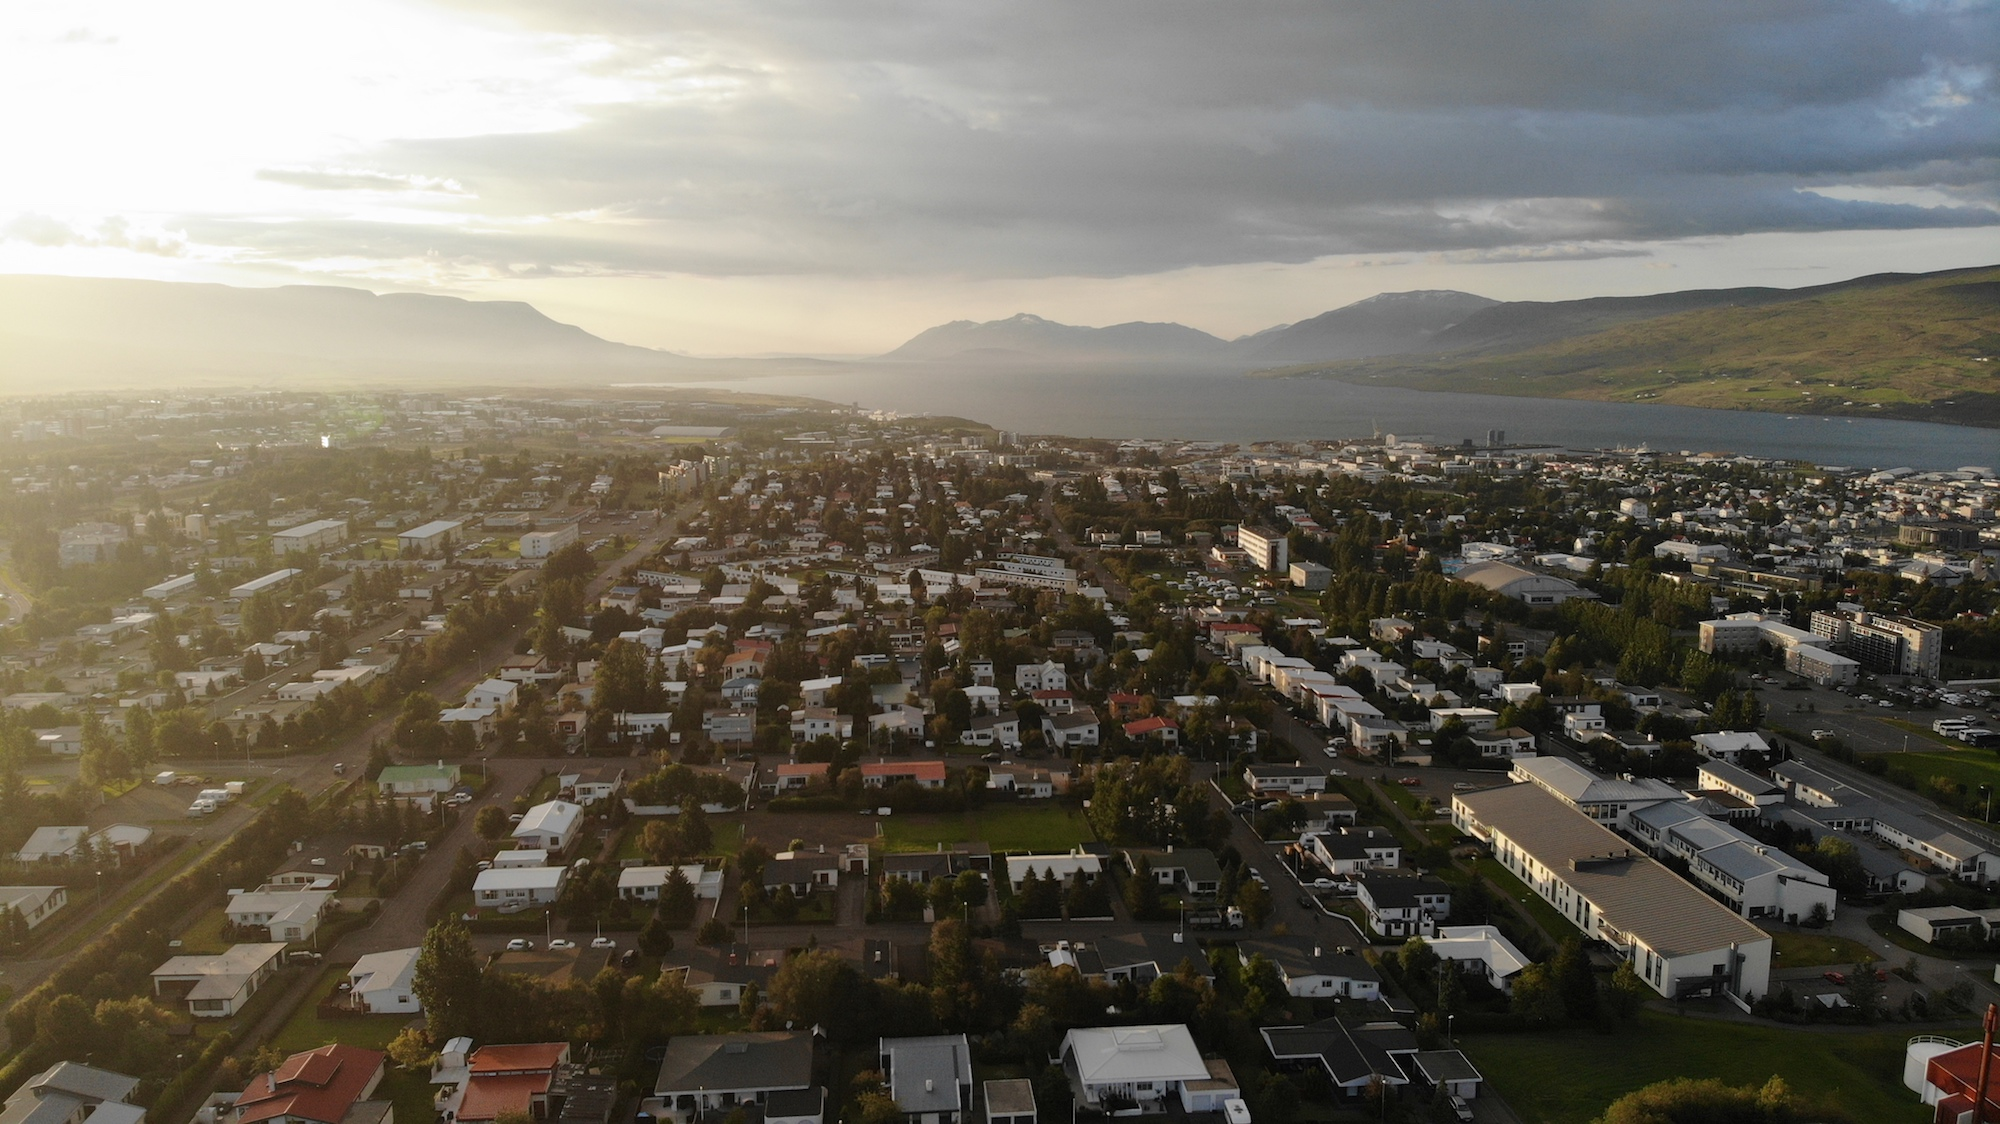 Undirbúa opnun kvennaathvarfs á Akureyri